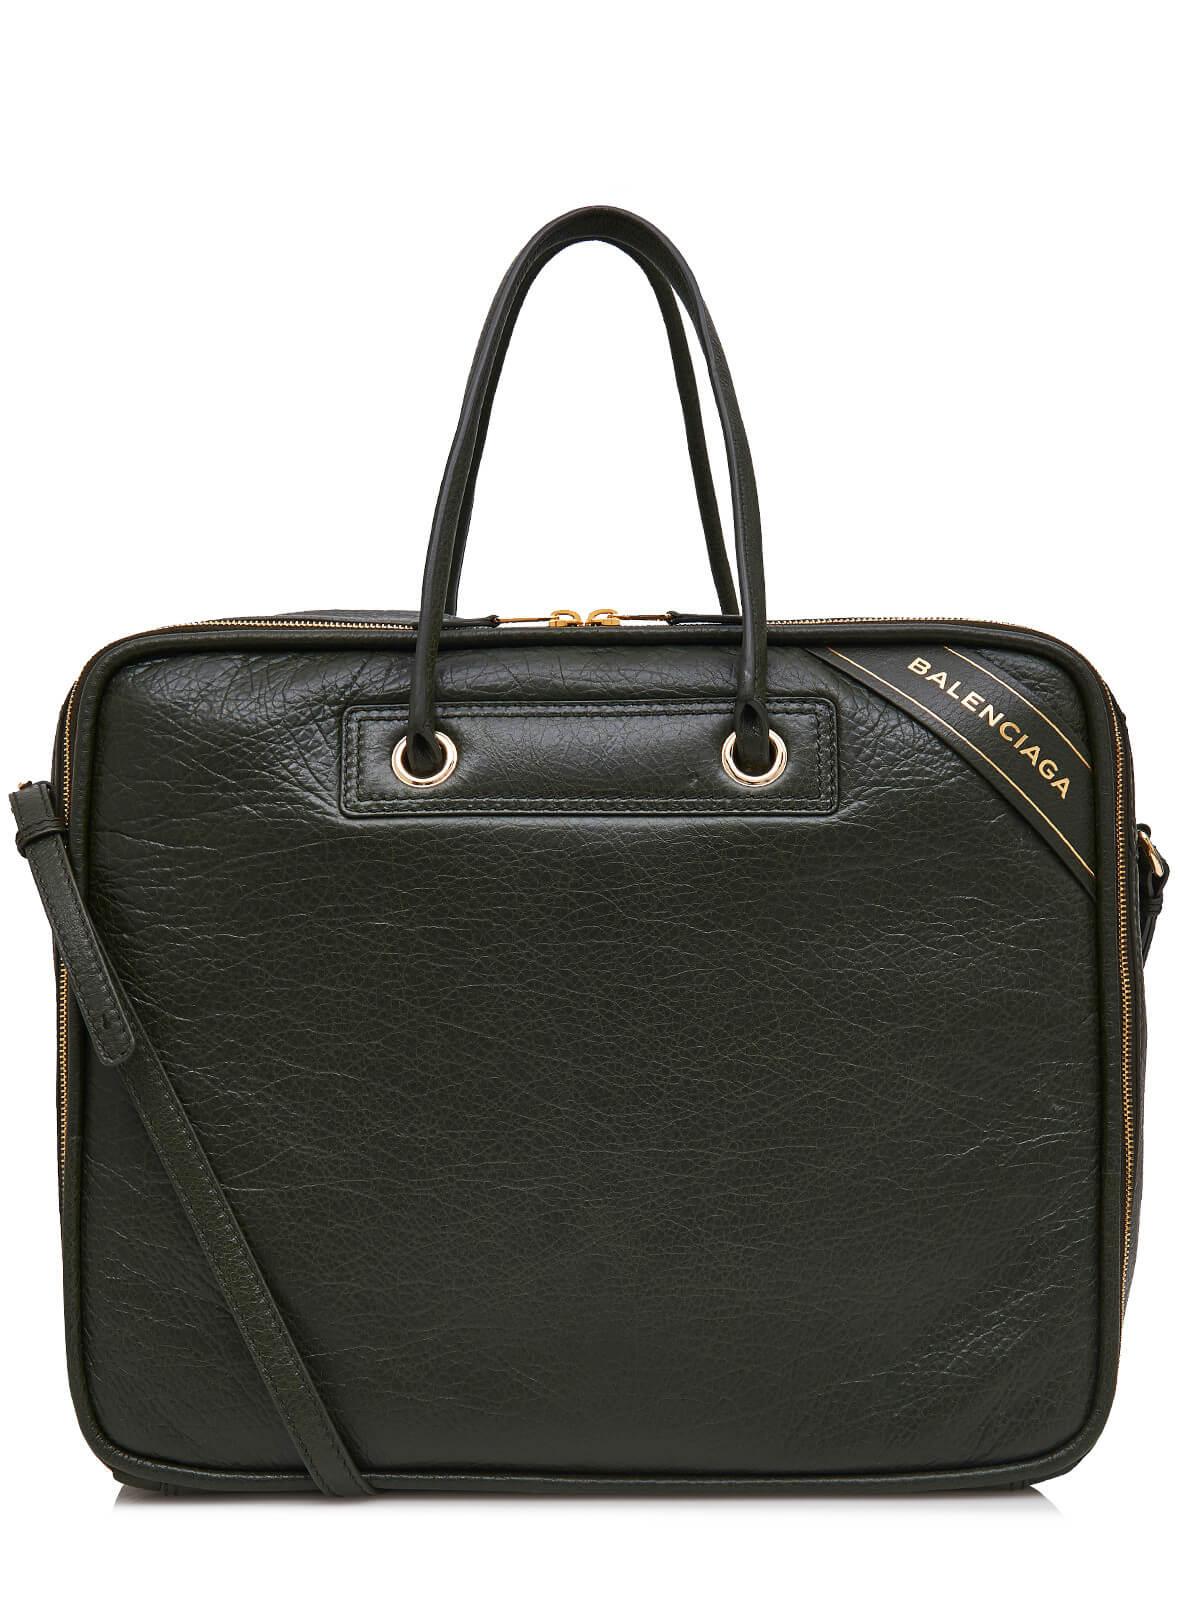 Balenciaga bag | Fashionesta online shop